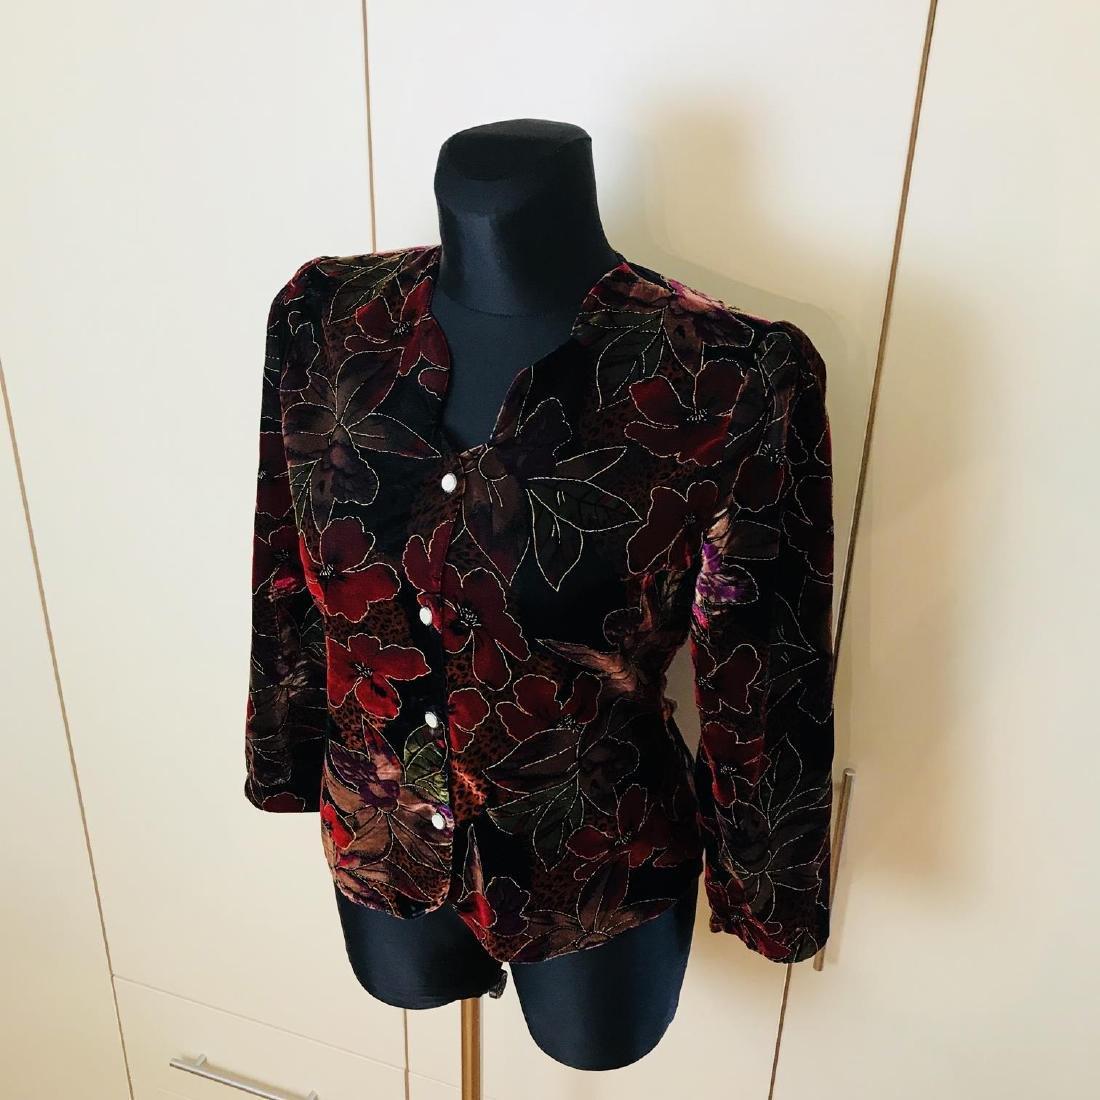 Vintage Women's Jacket Blazer Top Size US 10 EUR 40 - 3